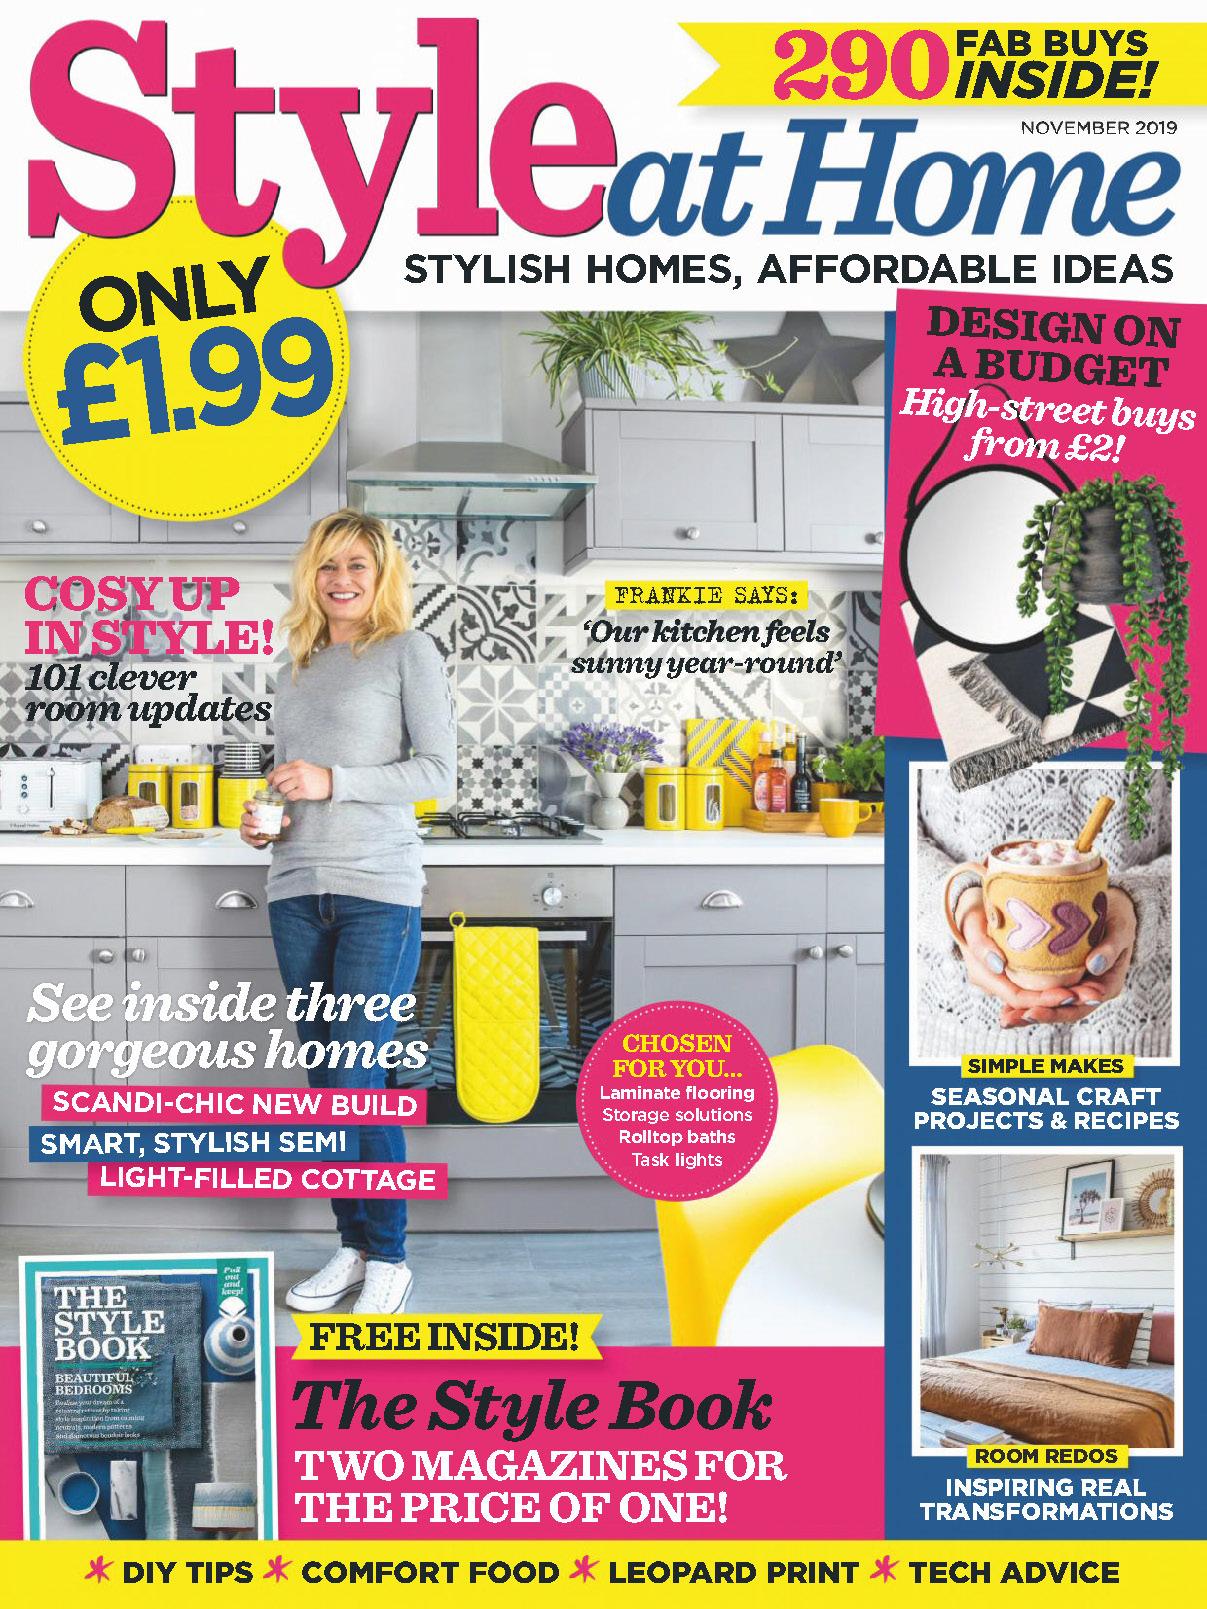 《Style at Home》英国版时尚家居杂志2019年11月号